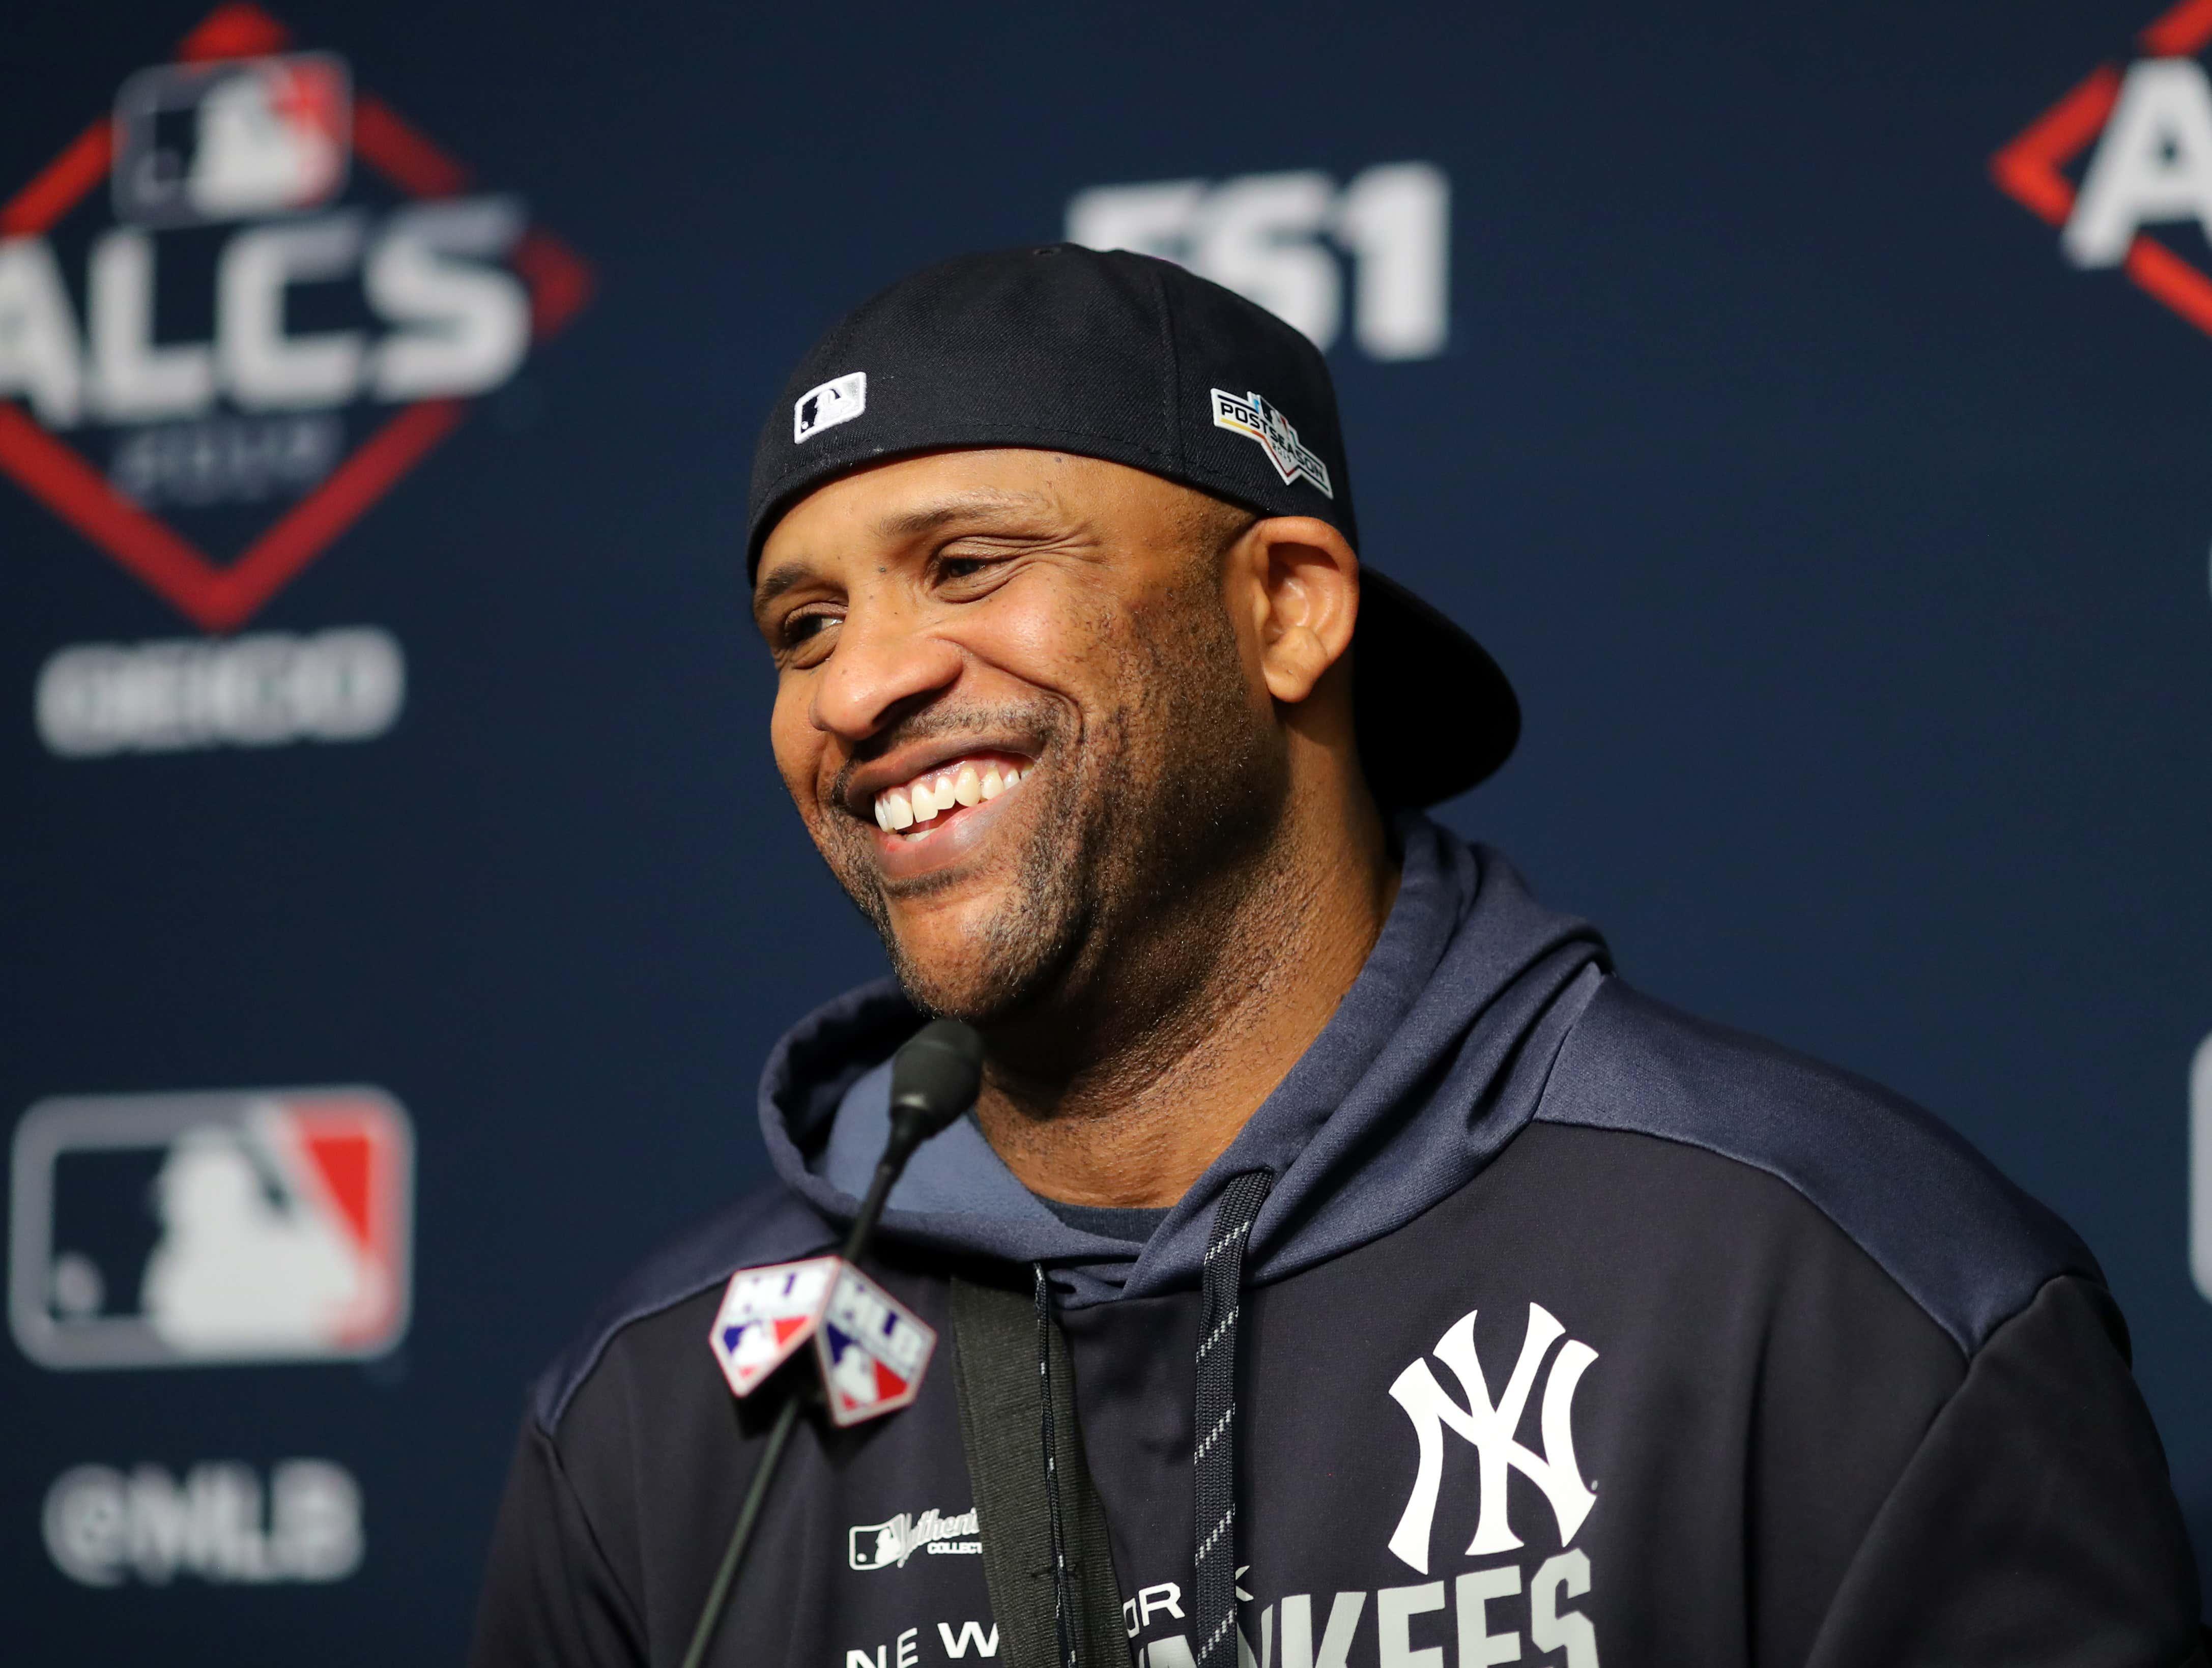 CC Sabathia On Wearing a Suit While Calling Baseball Games: \